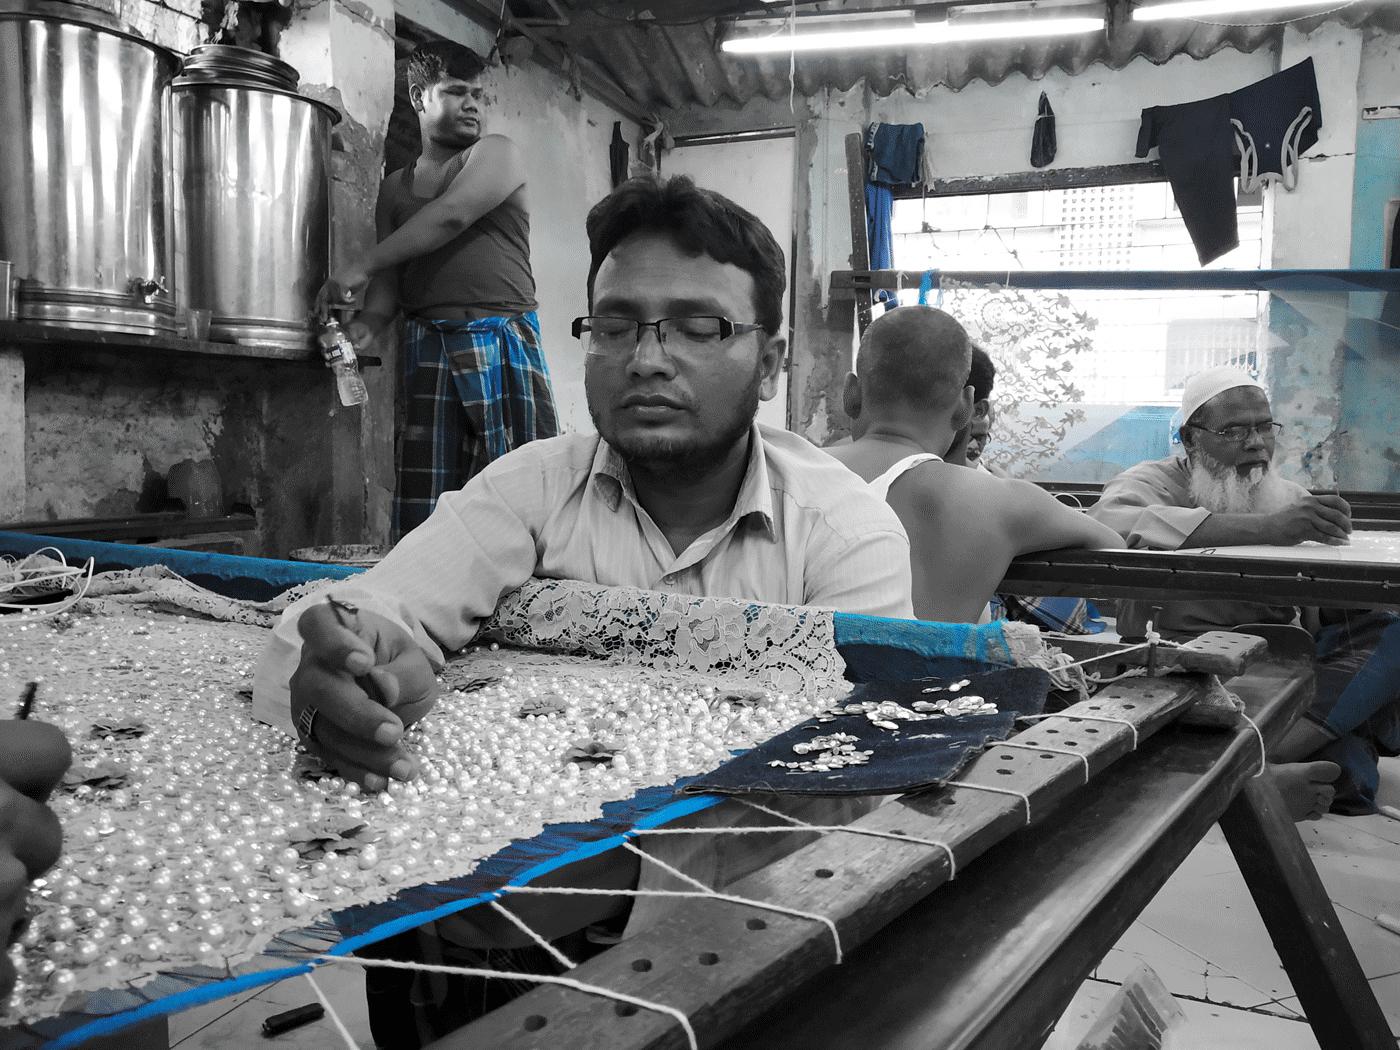 Urja, student of Banasthali Vidyapith, Newai, Rajasthan, did this story from Mumbai